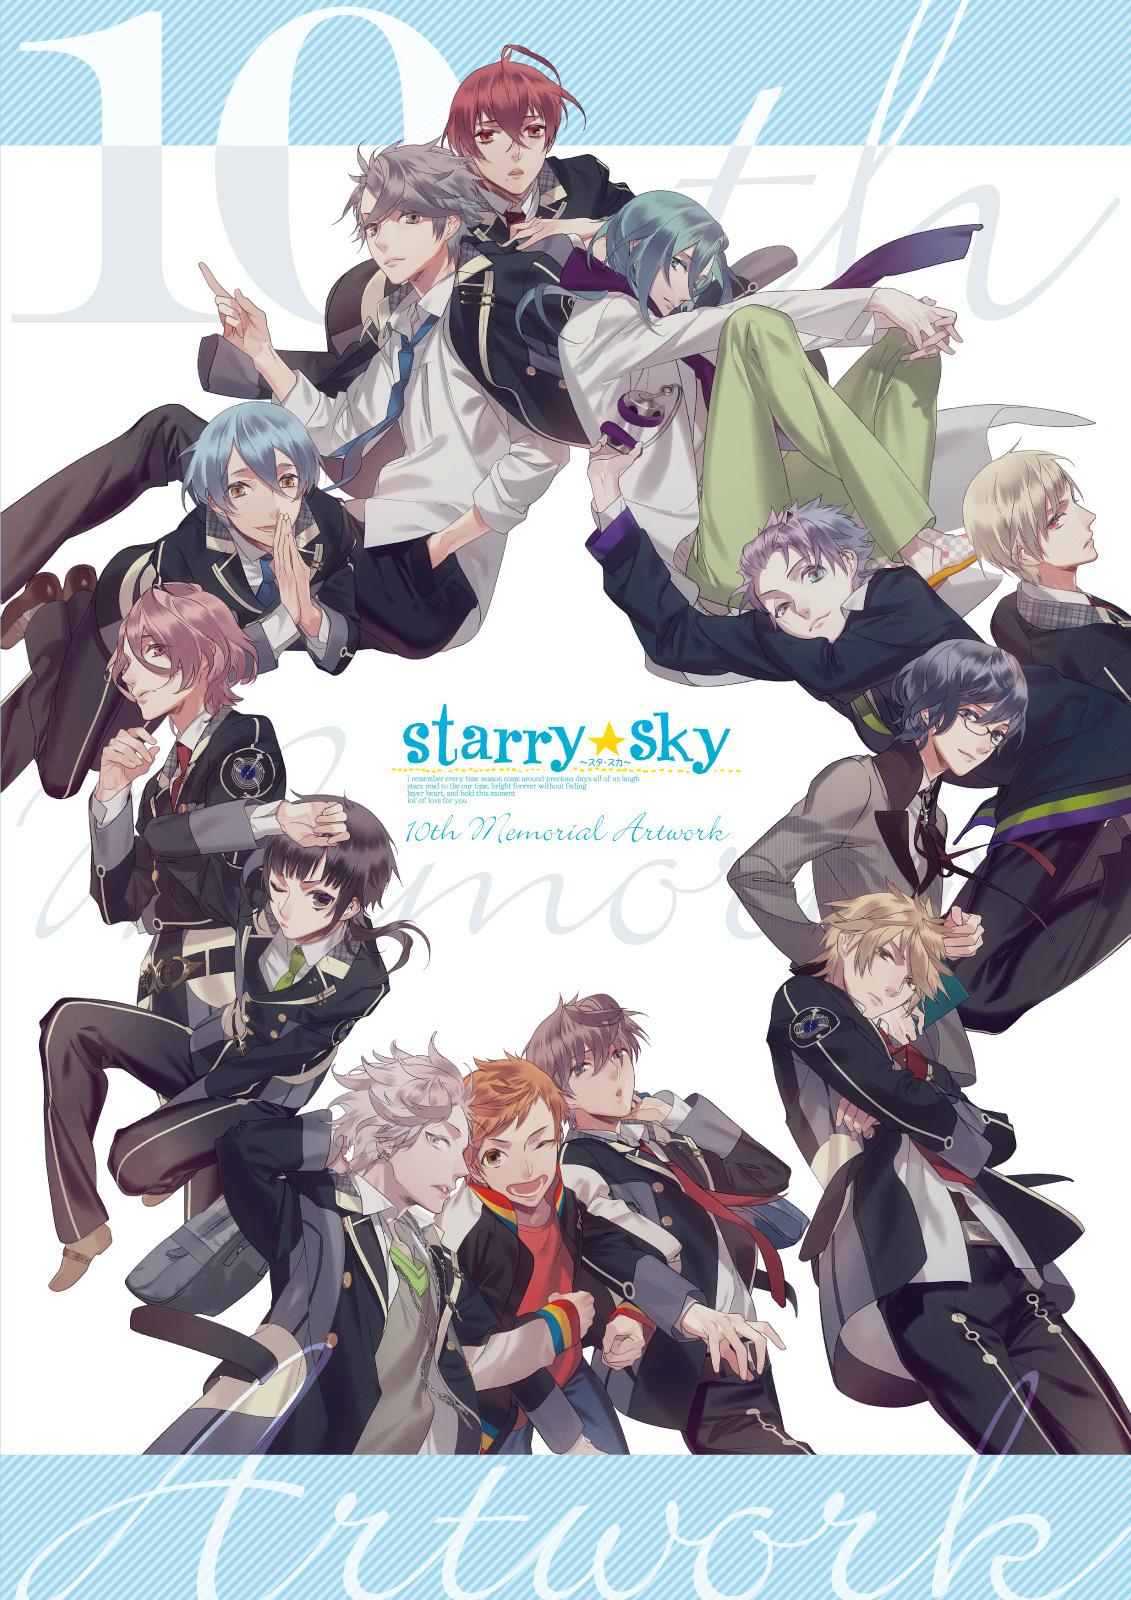 【2020/8/28発売】Starry☆Sky 10th Memorial Artwork